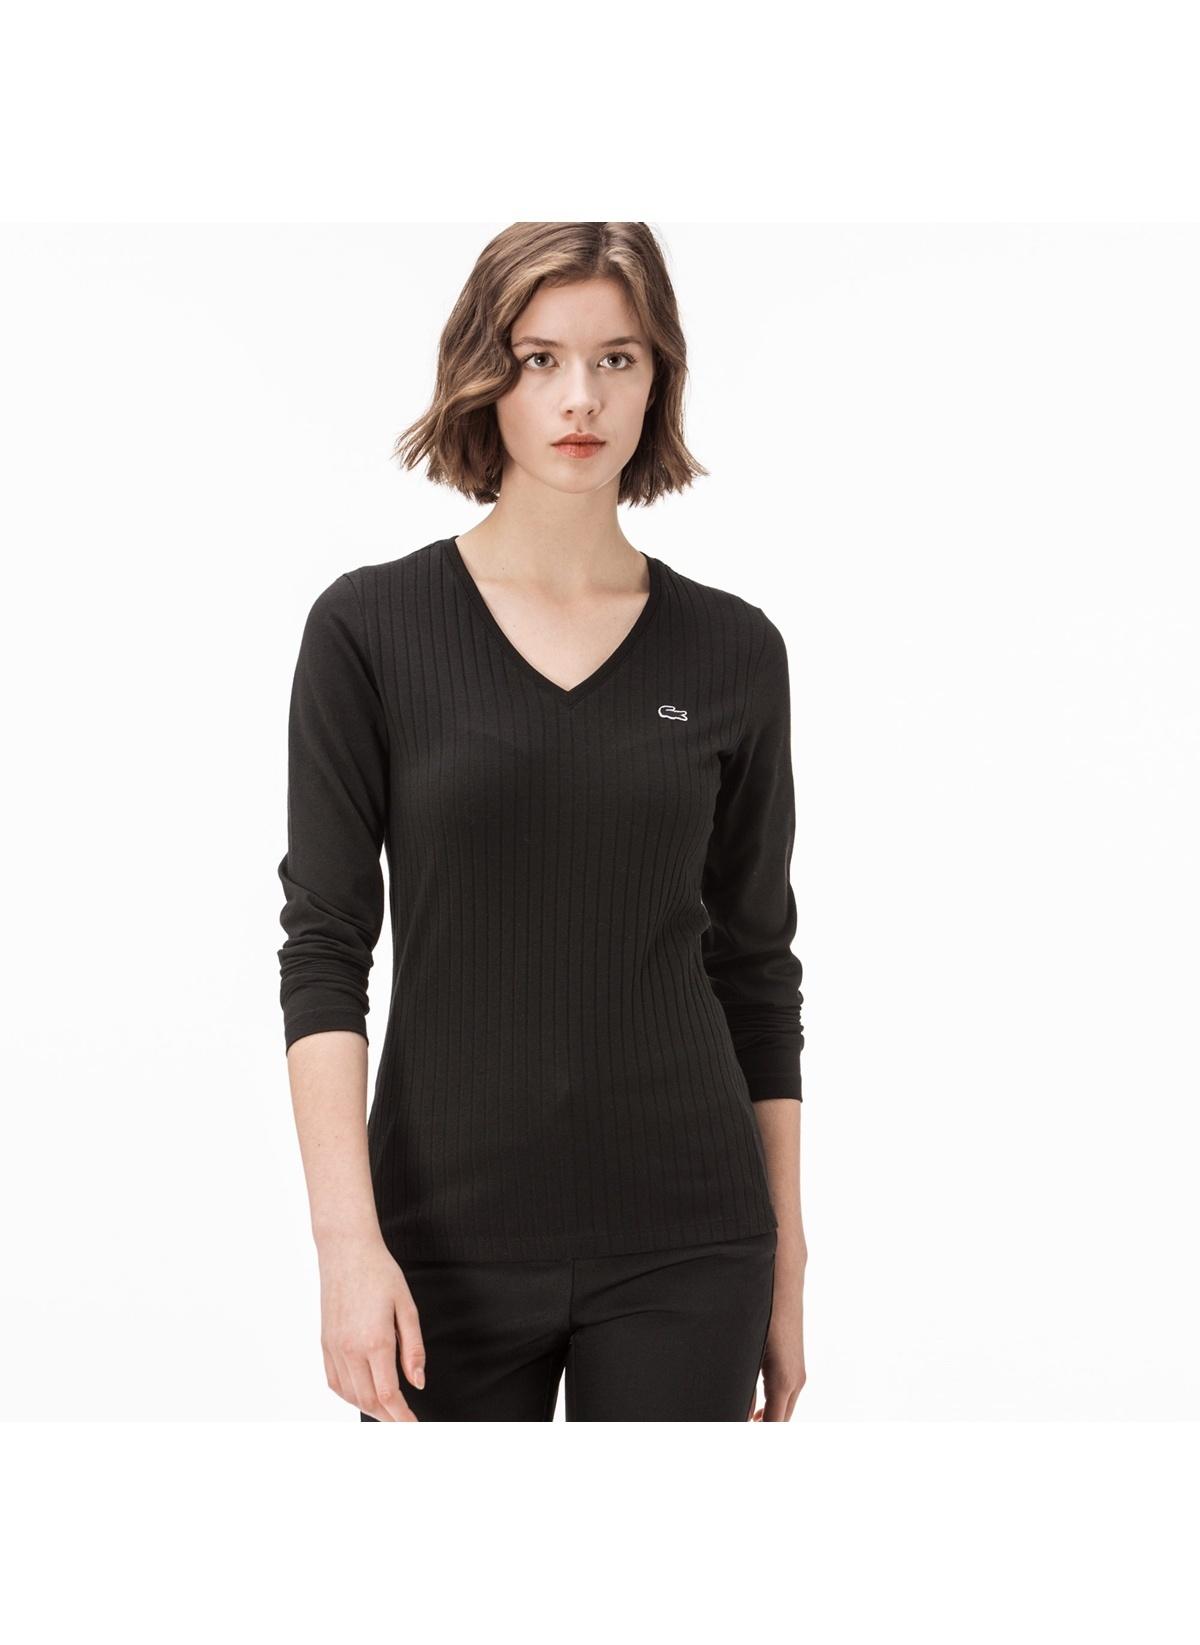 Lacoste Tişört Tf1911.11s T-shirt – 254.0 TL